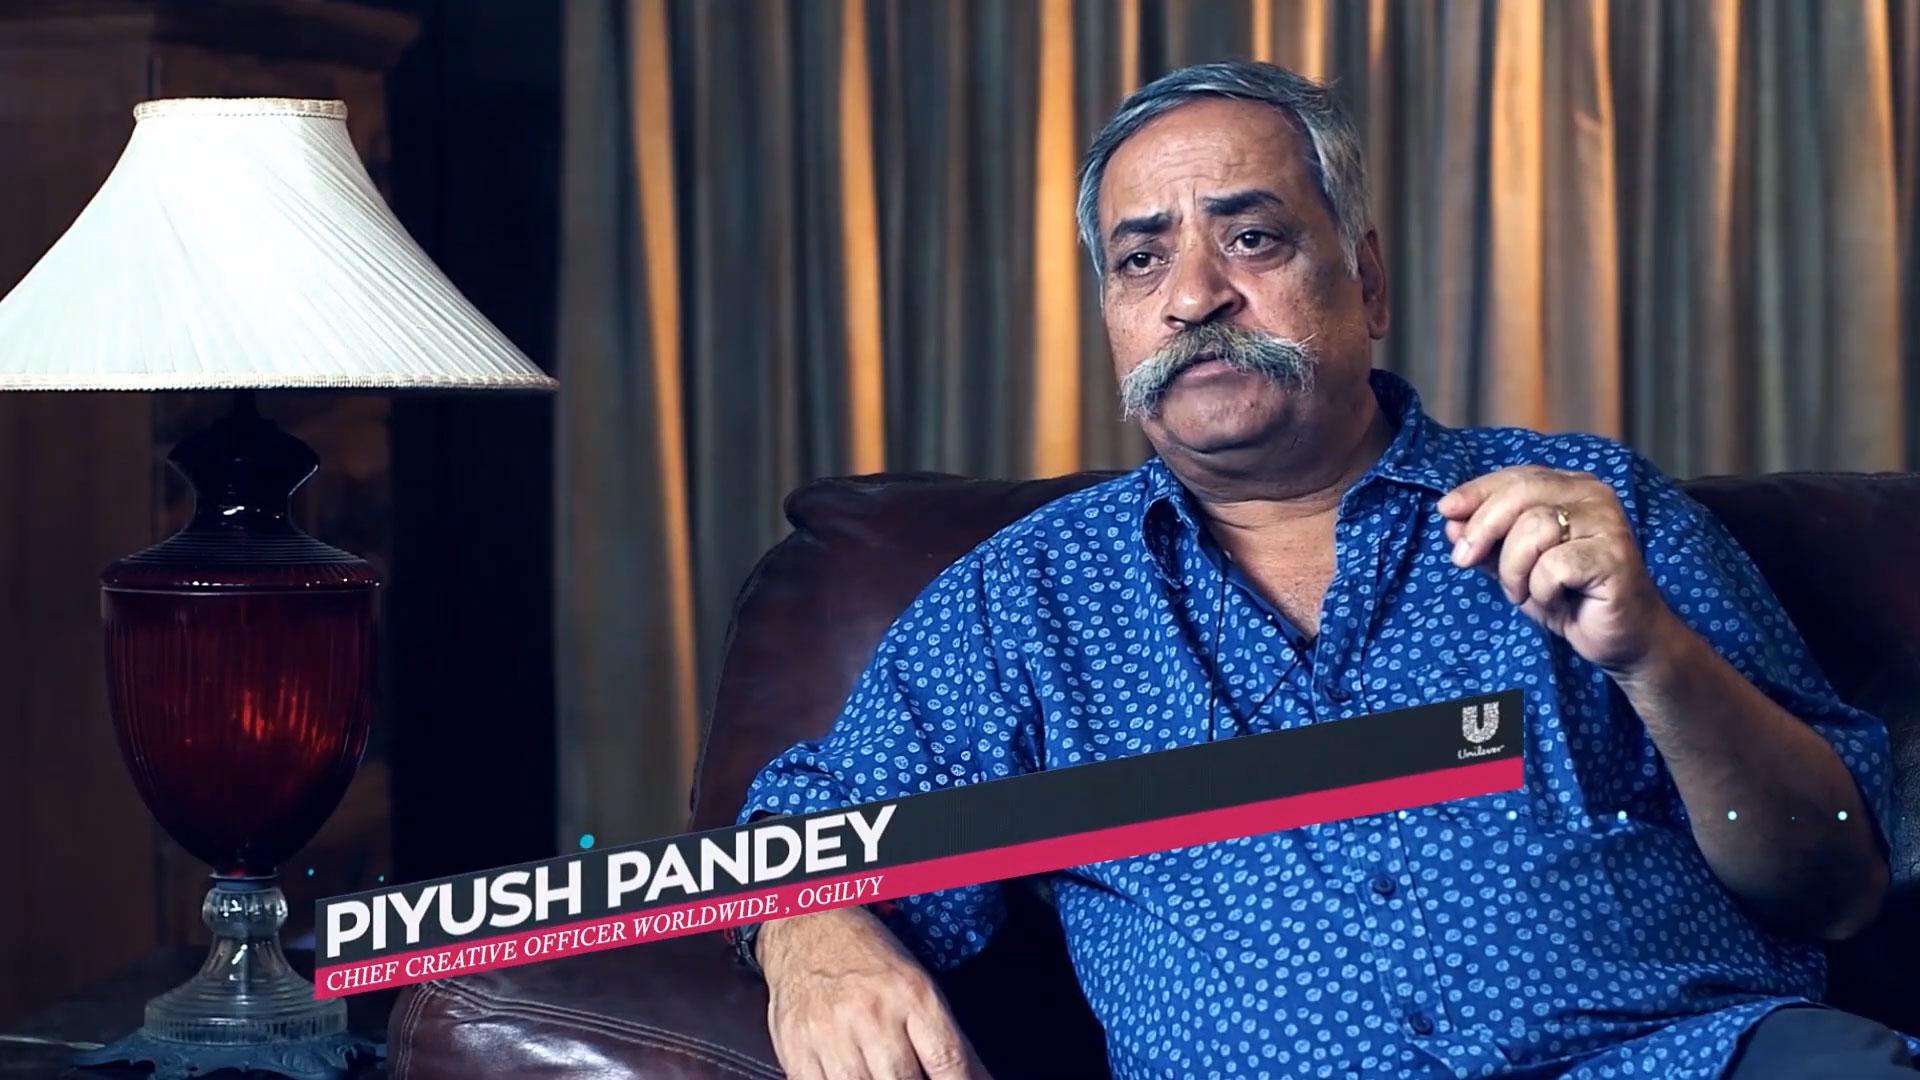 Piyush Pandey Chief Creative Officer worldwide, Ogilvy